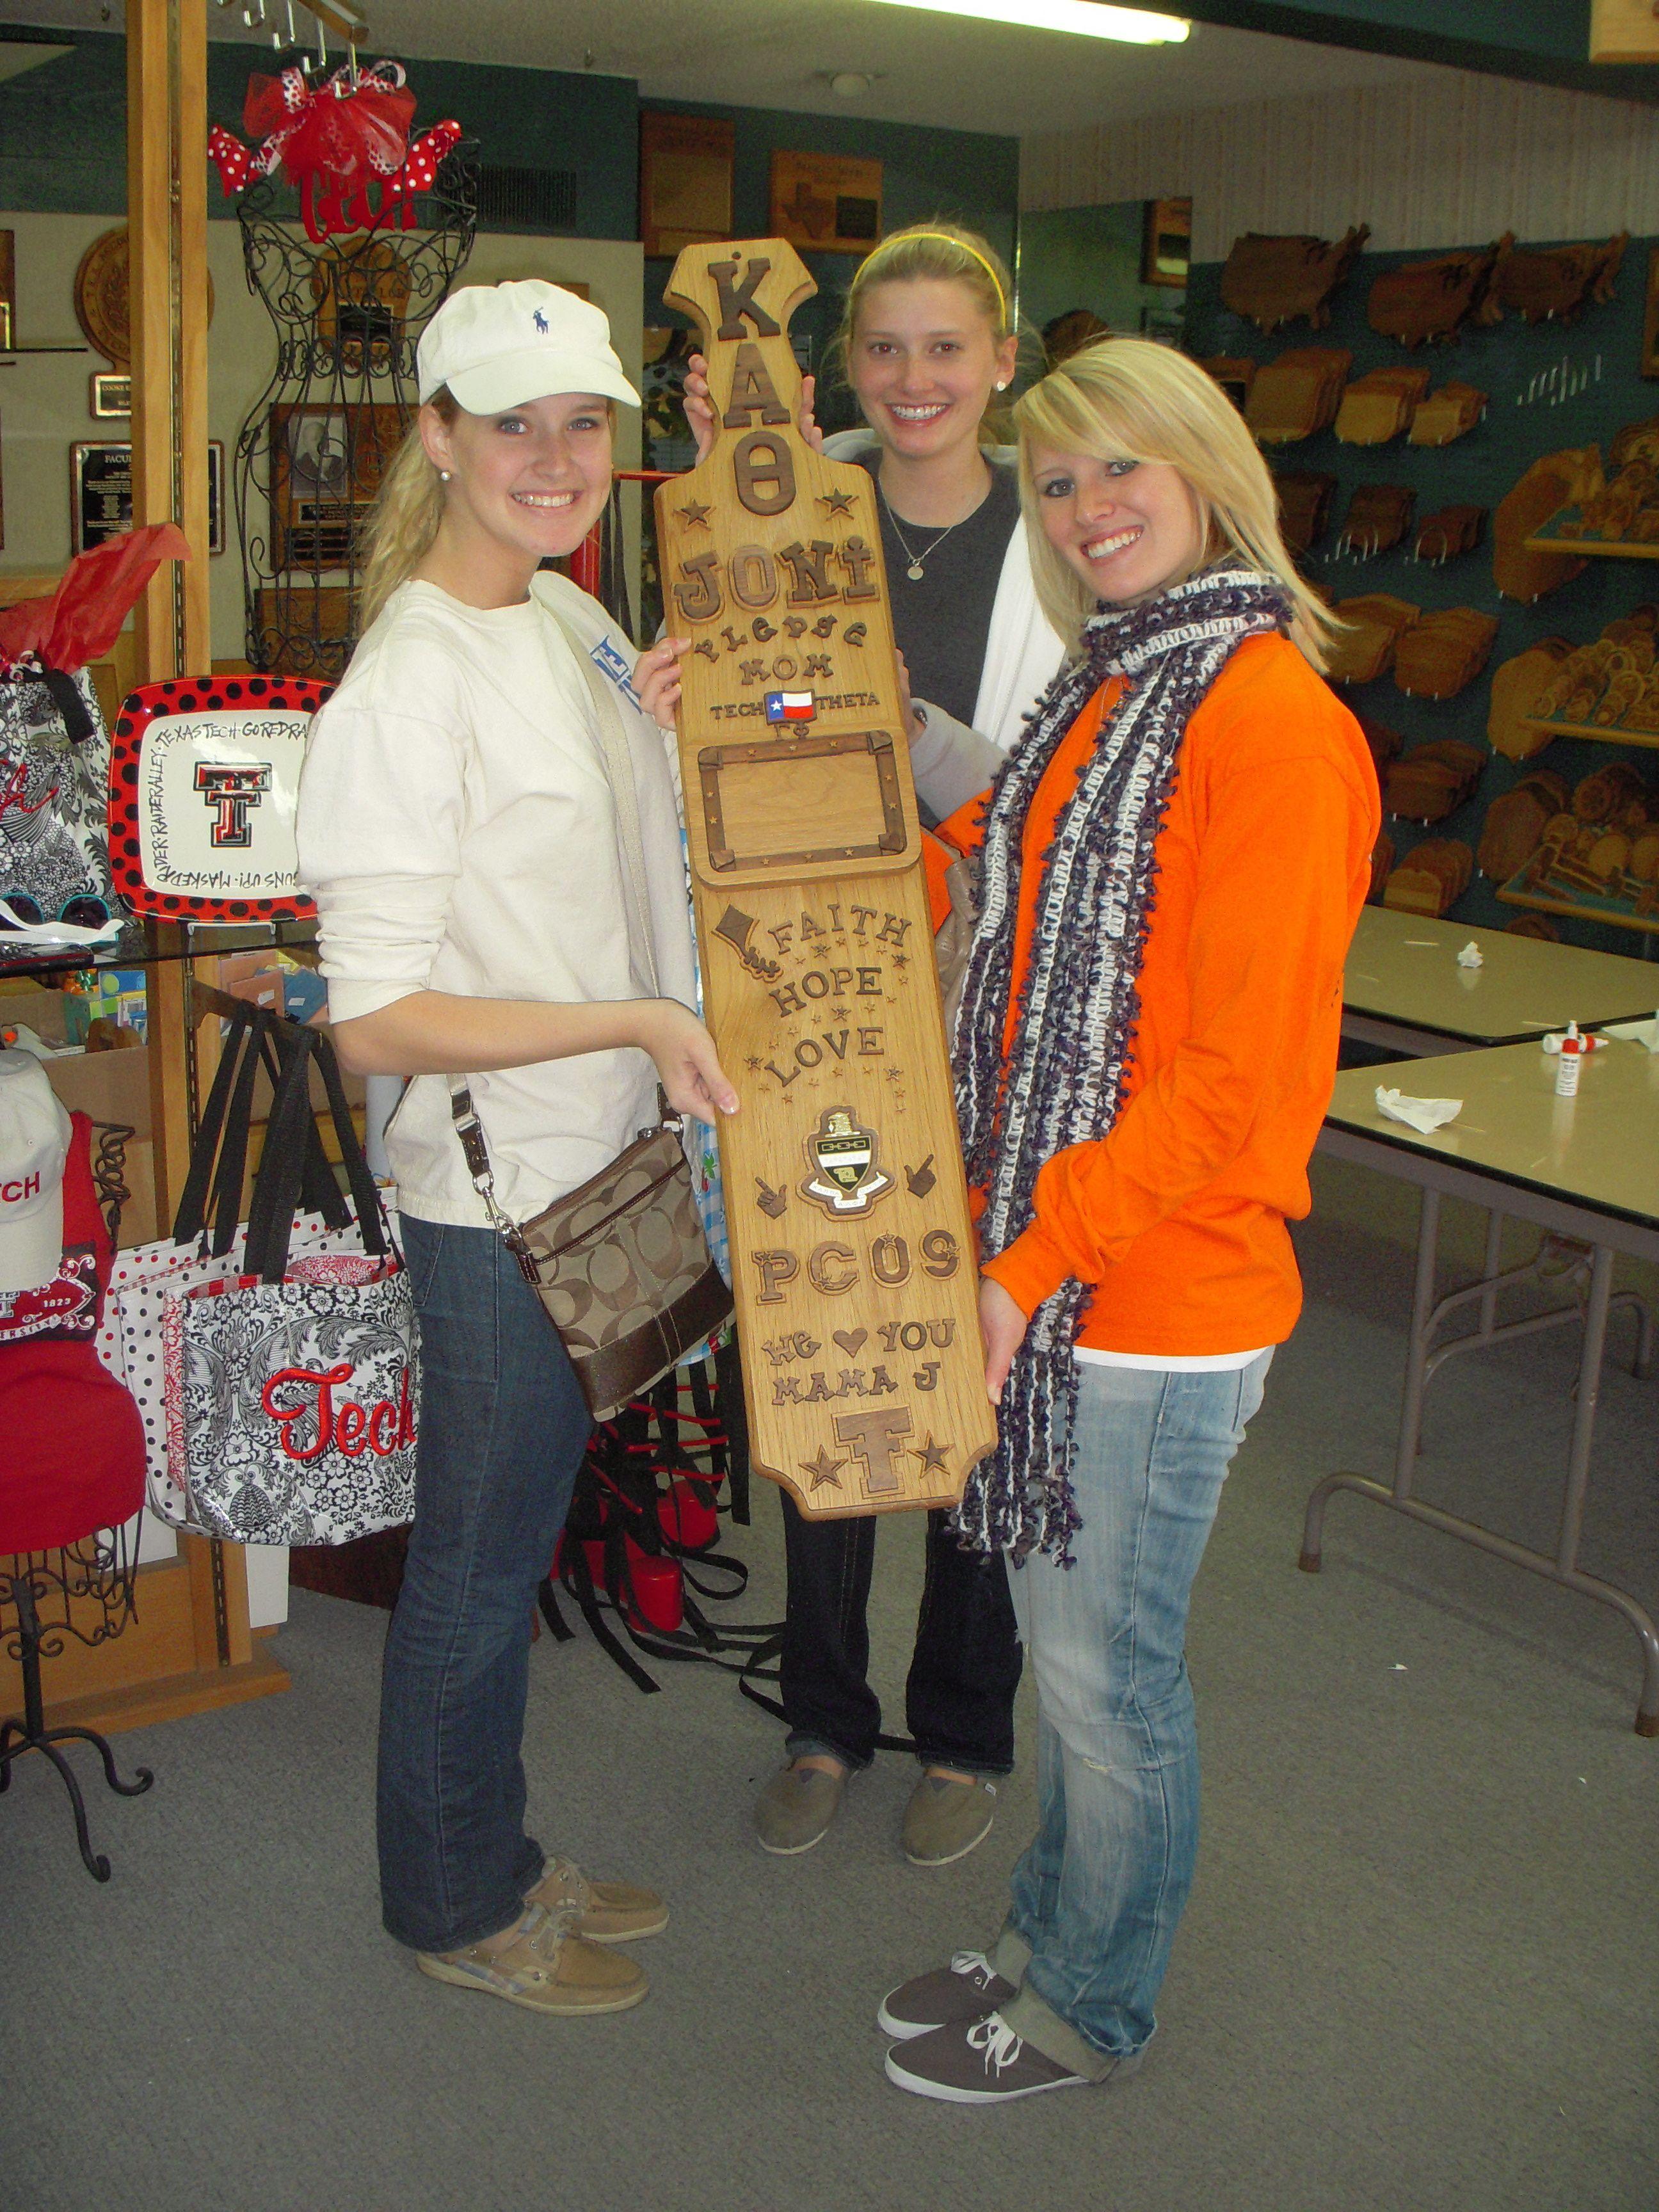 Kappa Alpha Theta Sorority Pledge Mom Paddle 4 Foot Paddle Paddletramps Pledgemom Sororitylife Greeklife Kappaalphatheta Thinktheta